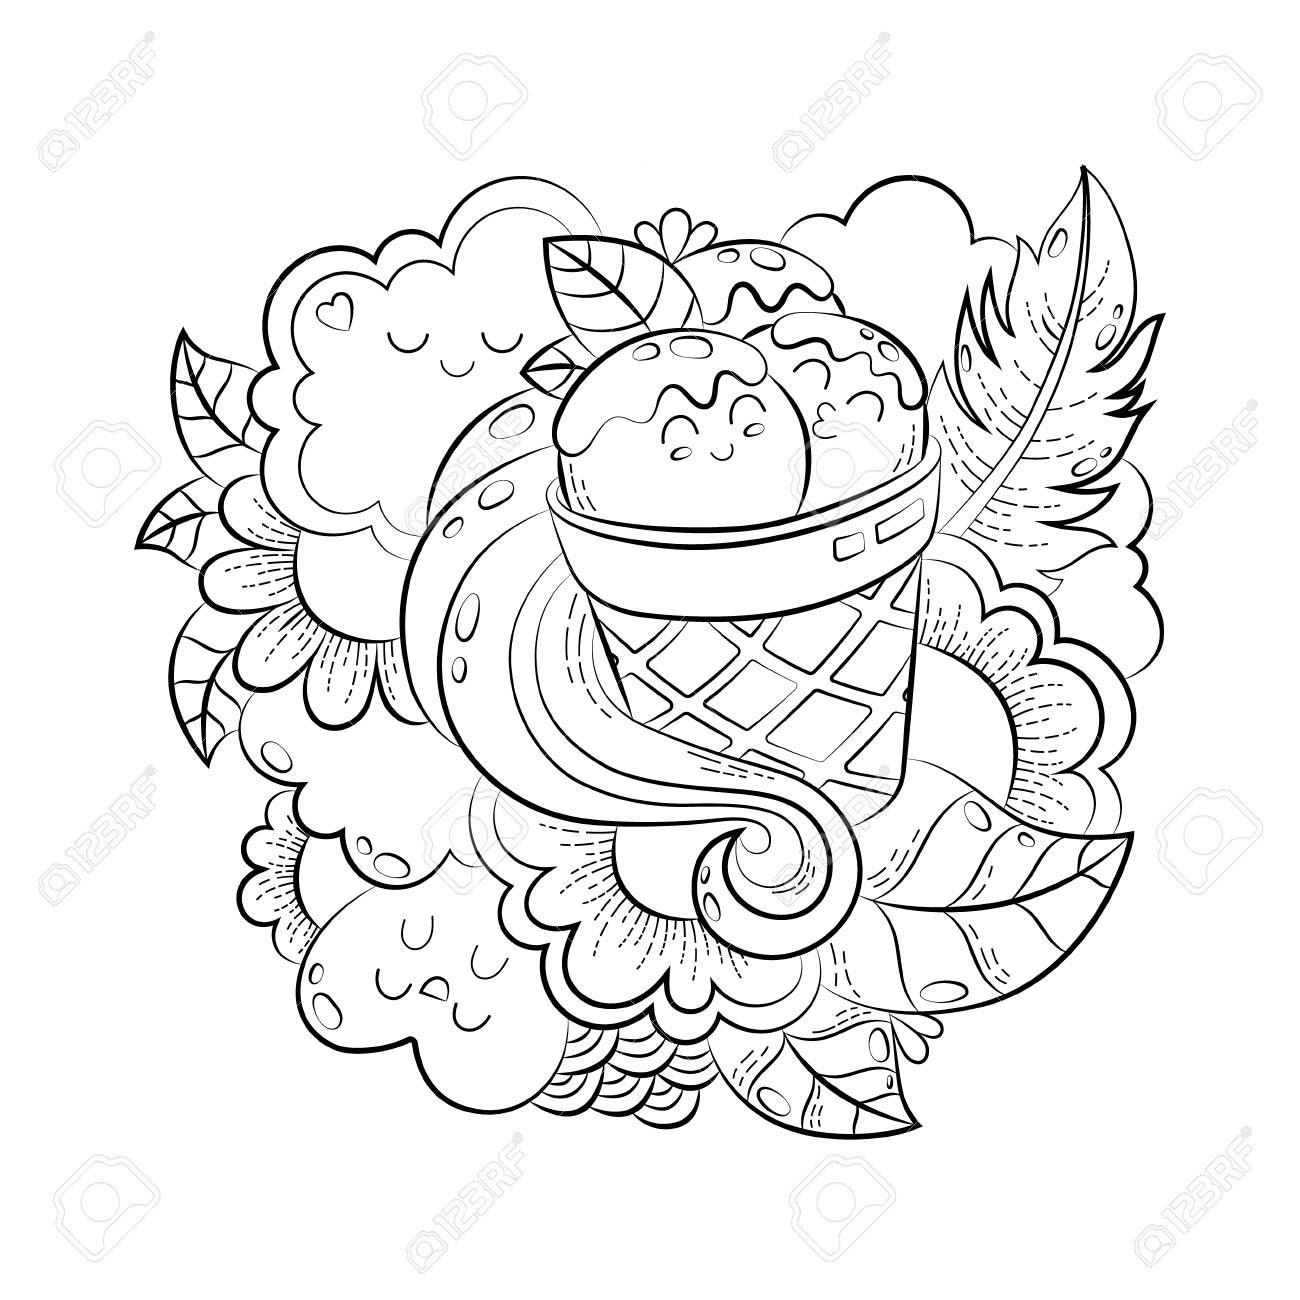 Vector hand drawn funny heart, cat, bird, sweet, cloud, balloon,..